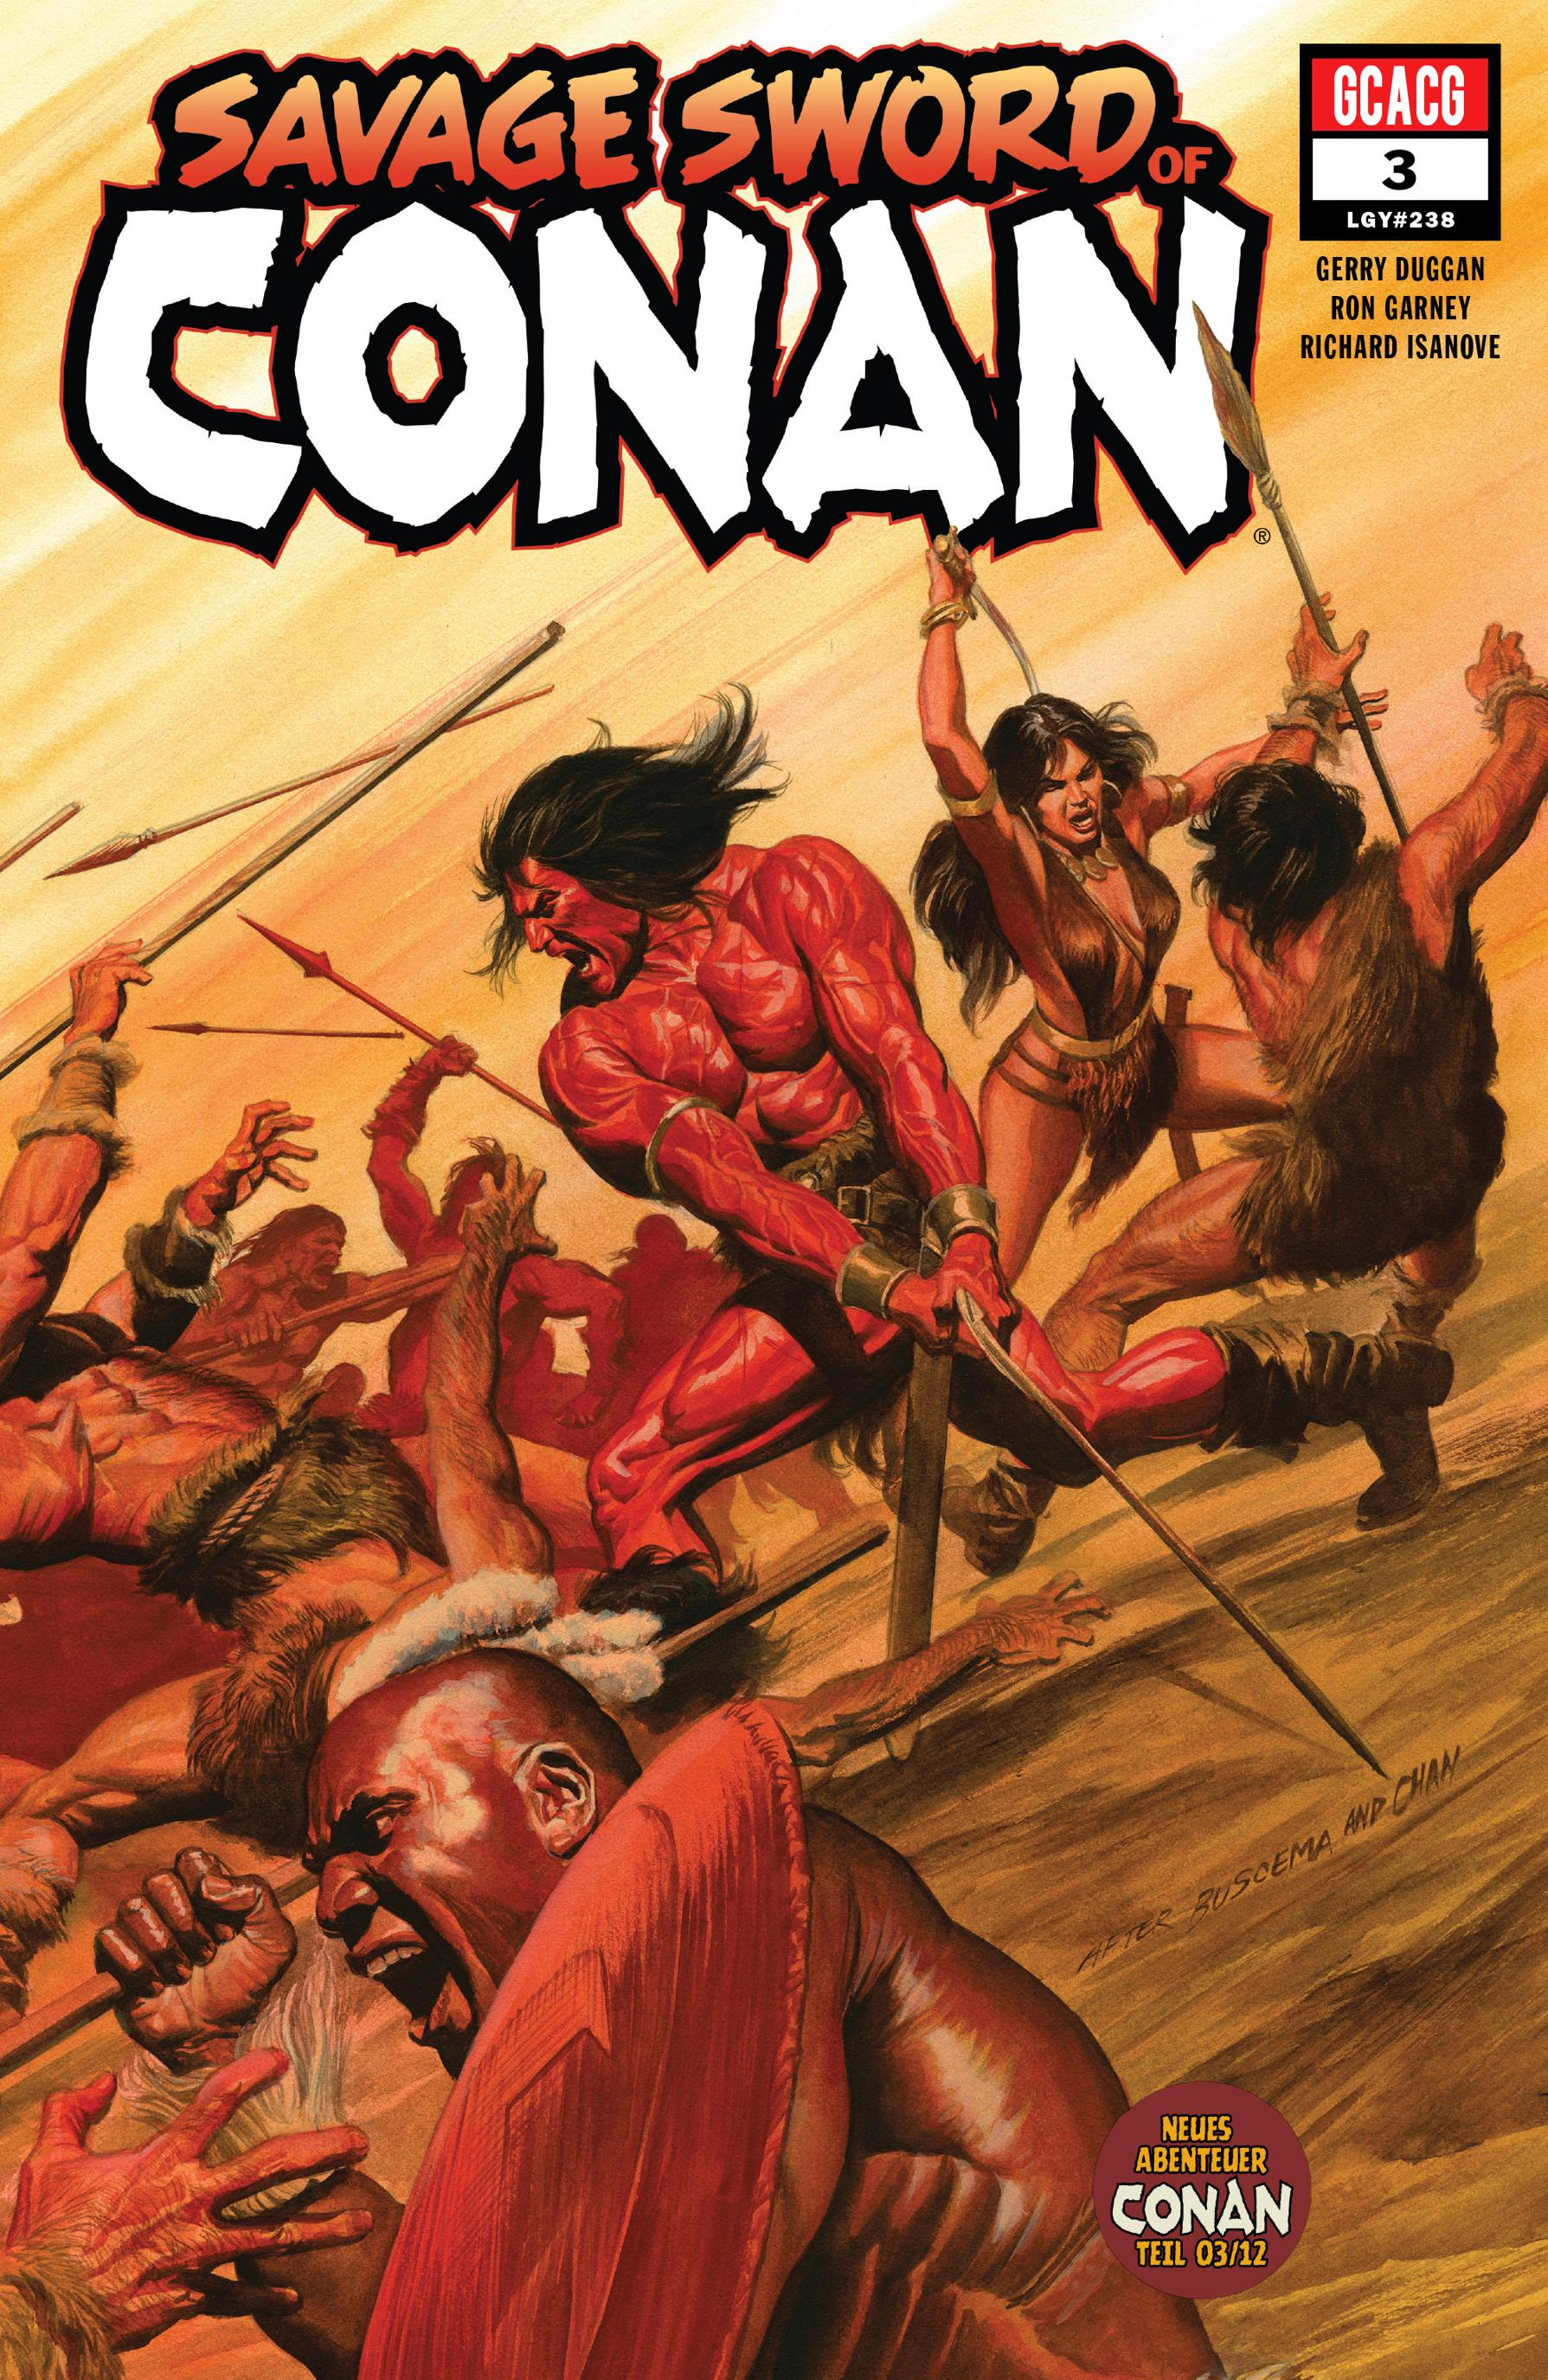 Savage Sword Of Conan 003 - Der Kult des Koga Thun 03 (2019) (Scanlation 738) (2019)